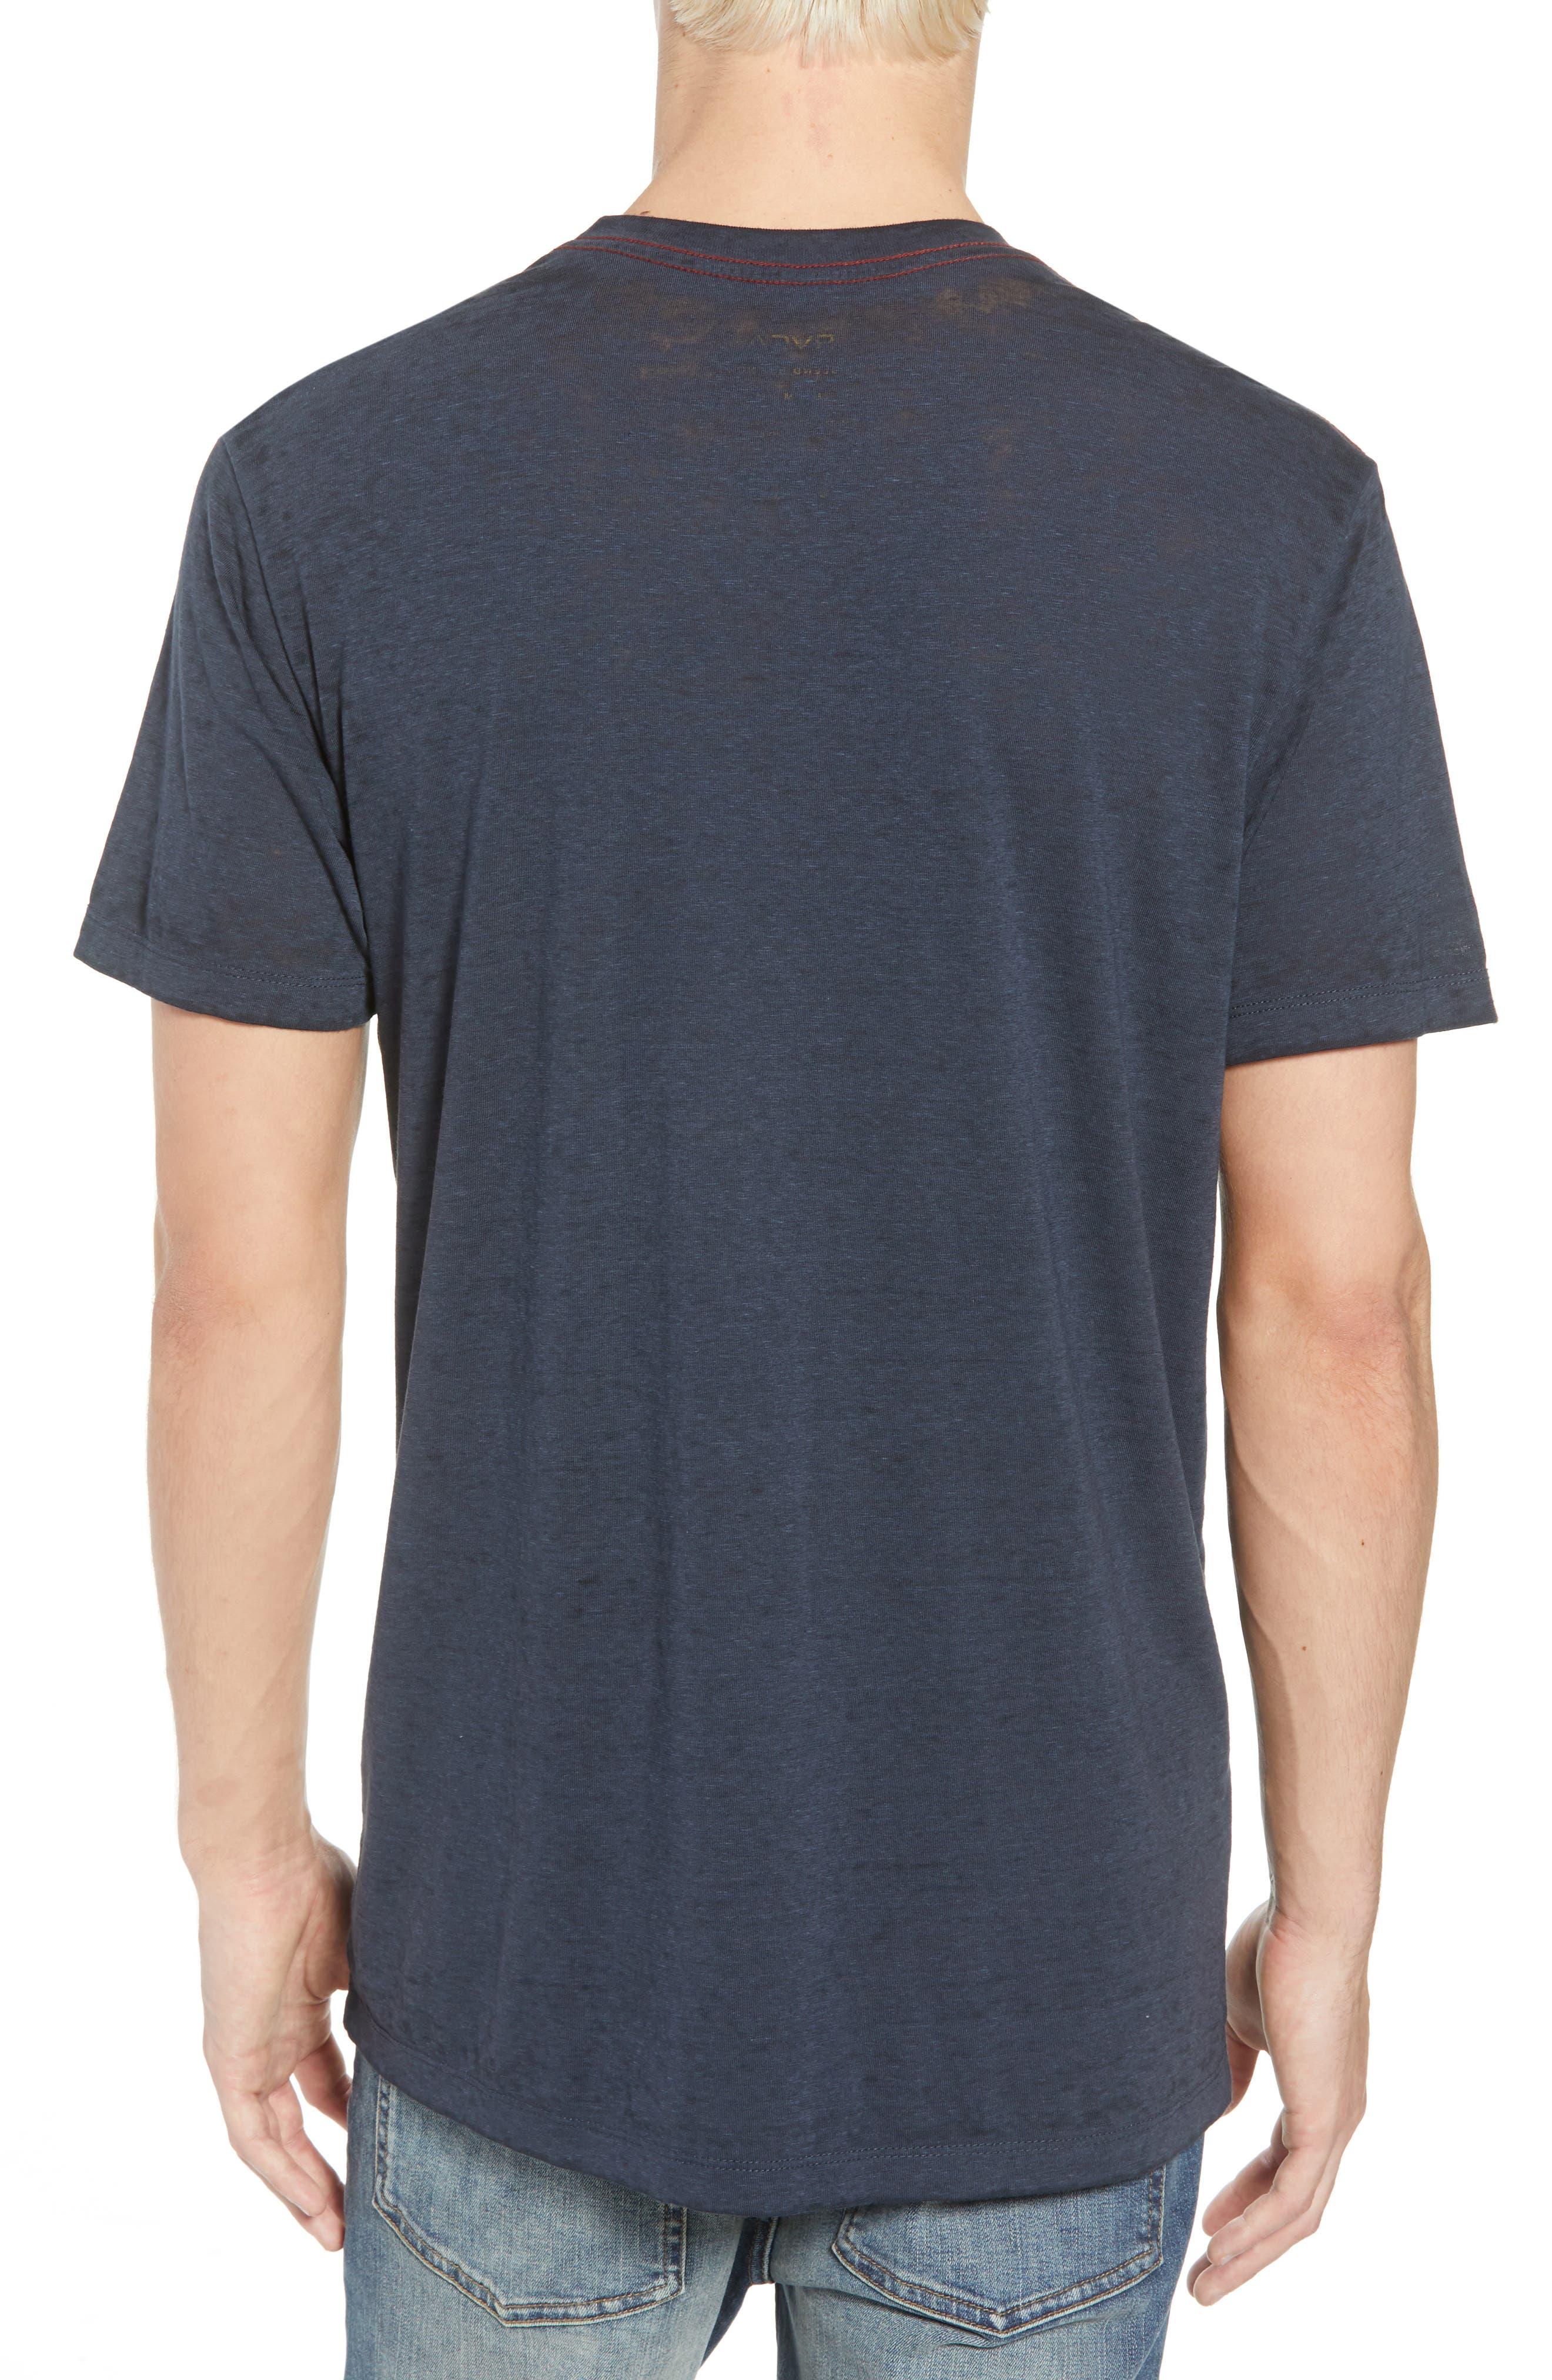 Tri-Motors Burnout T-Shirt,                             Alternate thumbnail 2, color,                             063